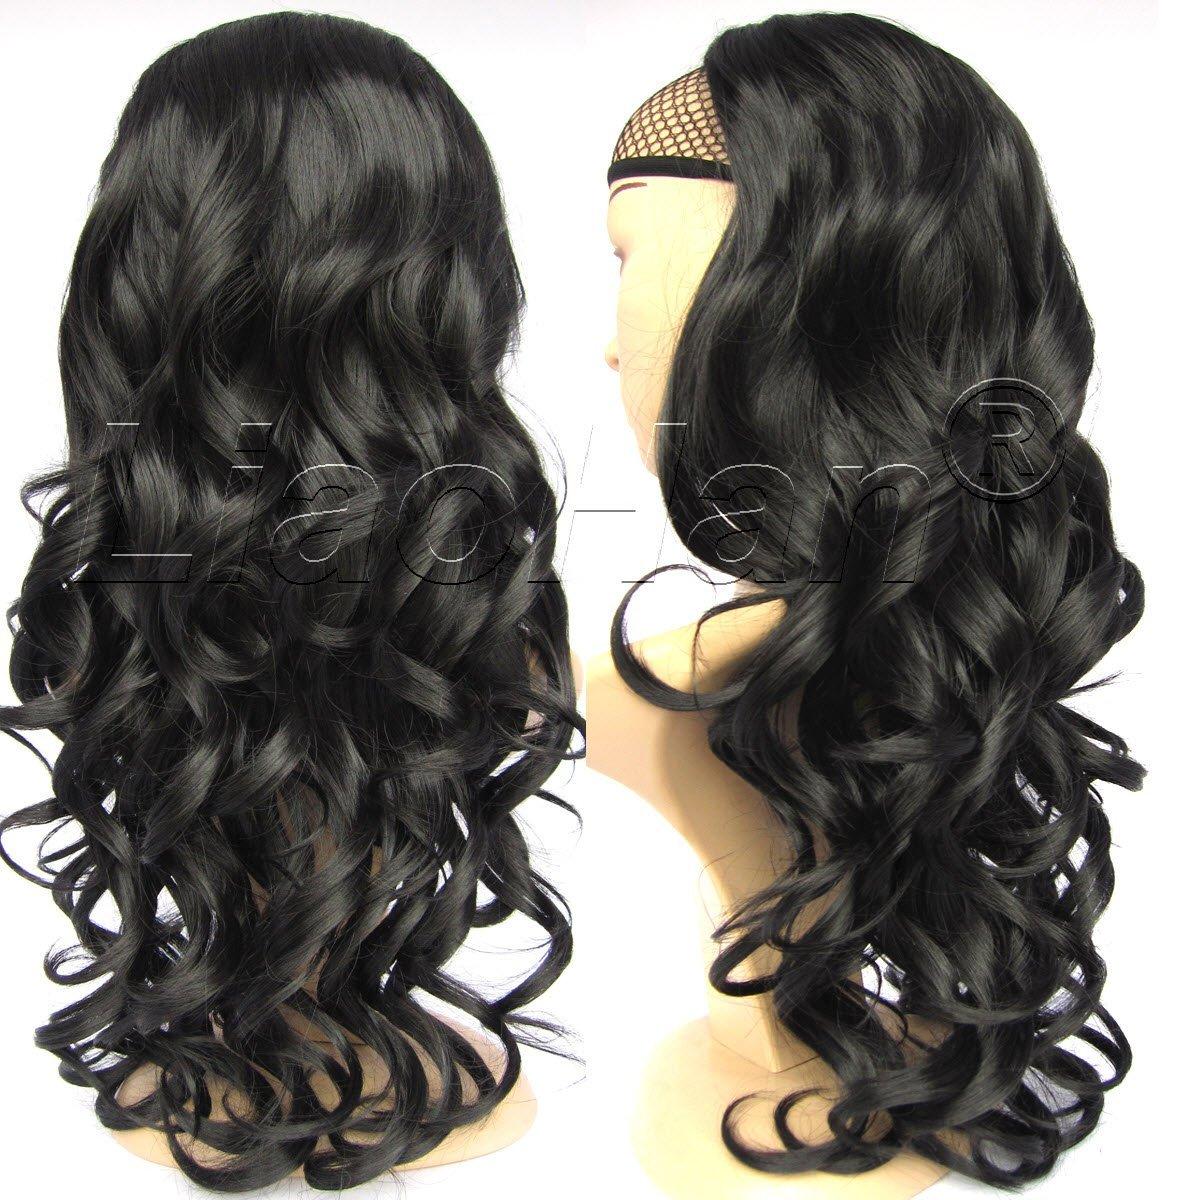 Liaohan® Fashion Half Wig Hair Fall Black Color Long Curly Wig Fall Curly Hair Wigs for Women #1B Black Wig